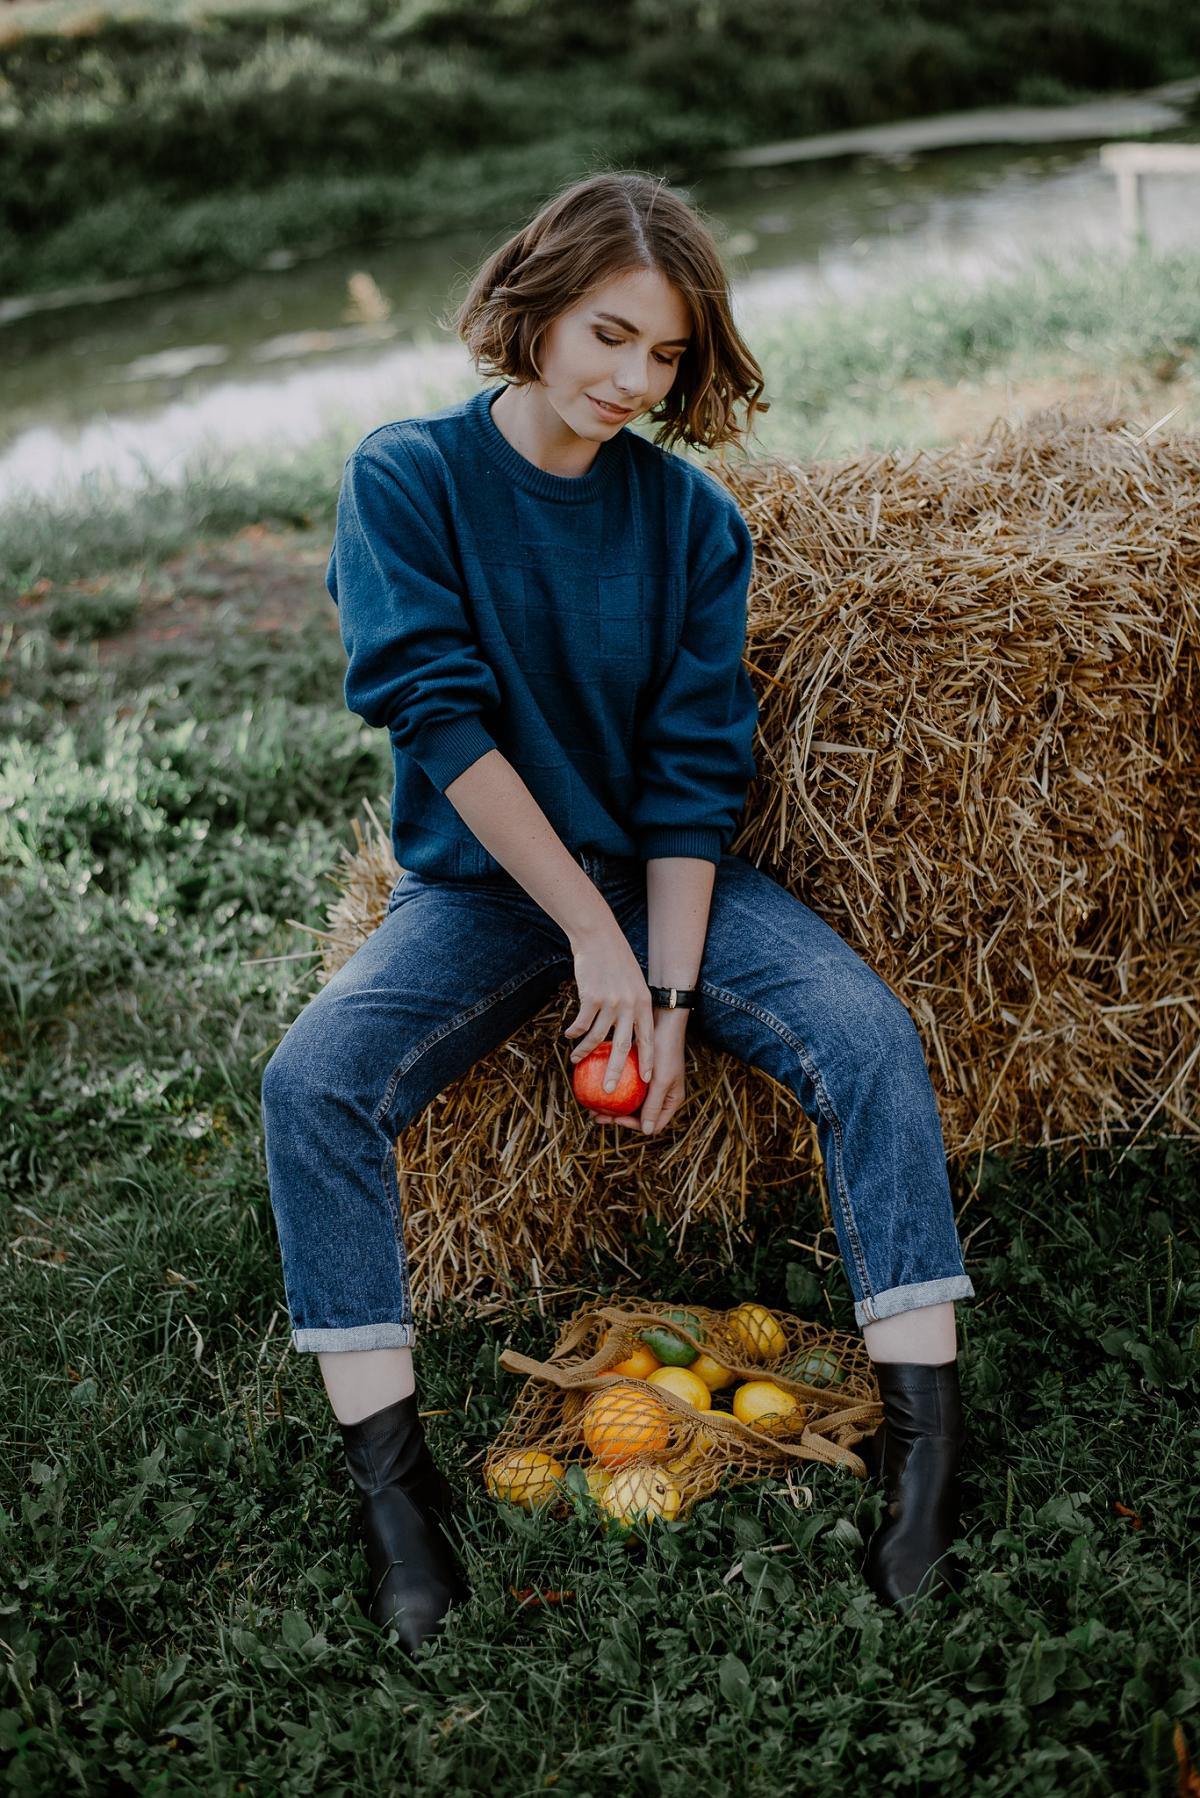 Magiczna kawiarenka we Wróblewie, sweter second hand, mom jeans, siano